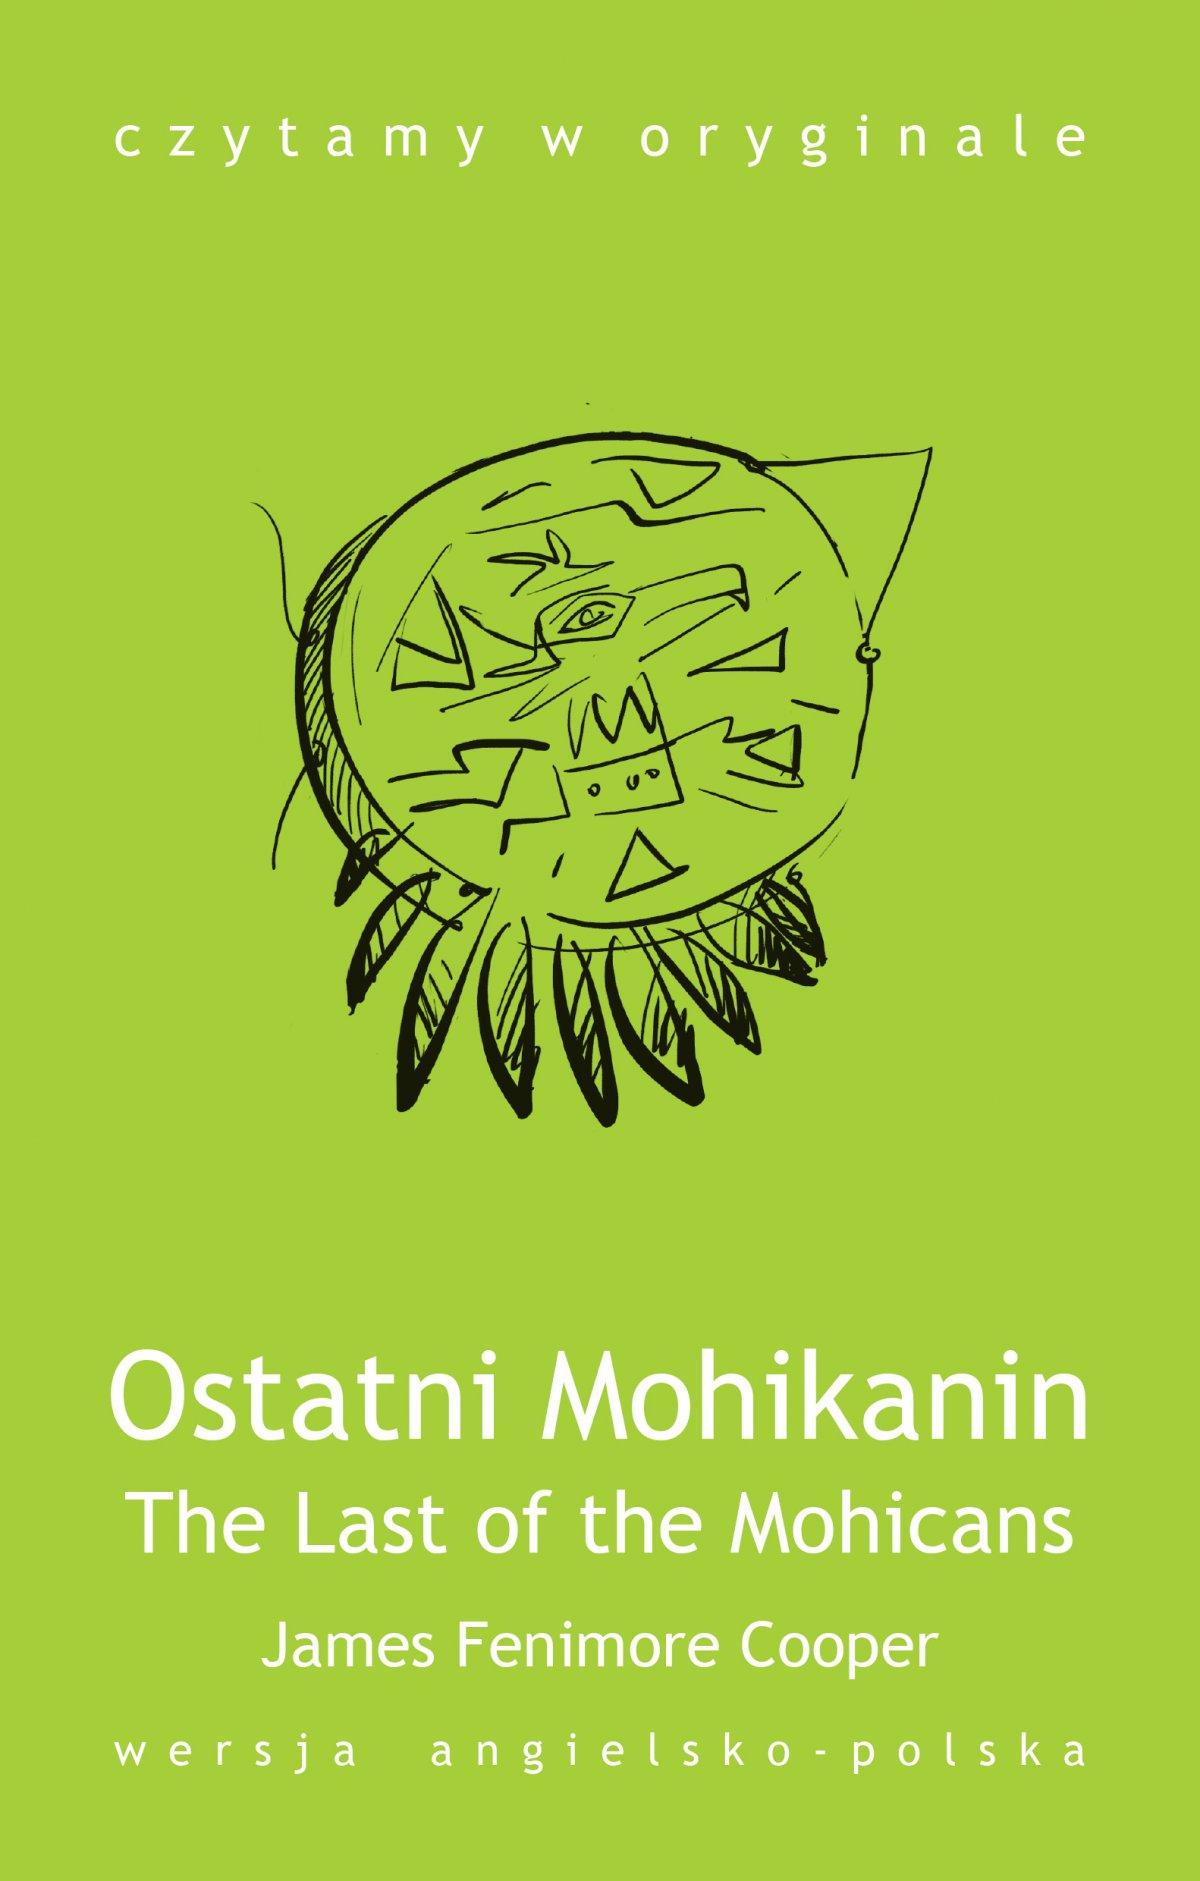 The Last of the Mohicans / Ostatni Mohikanin - Ebook (Książka na Kindle) do pobrania w formacie MOBI